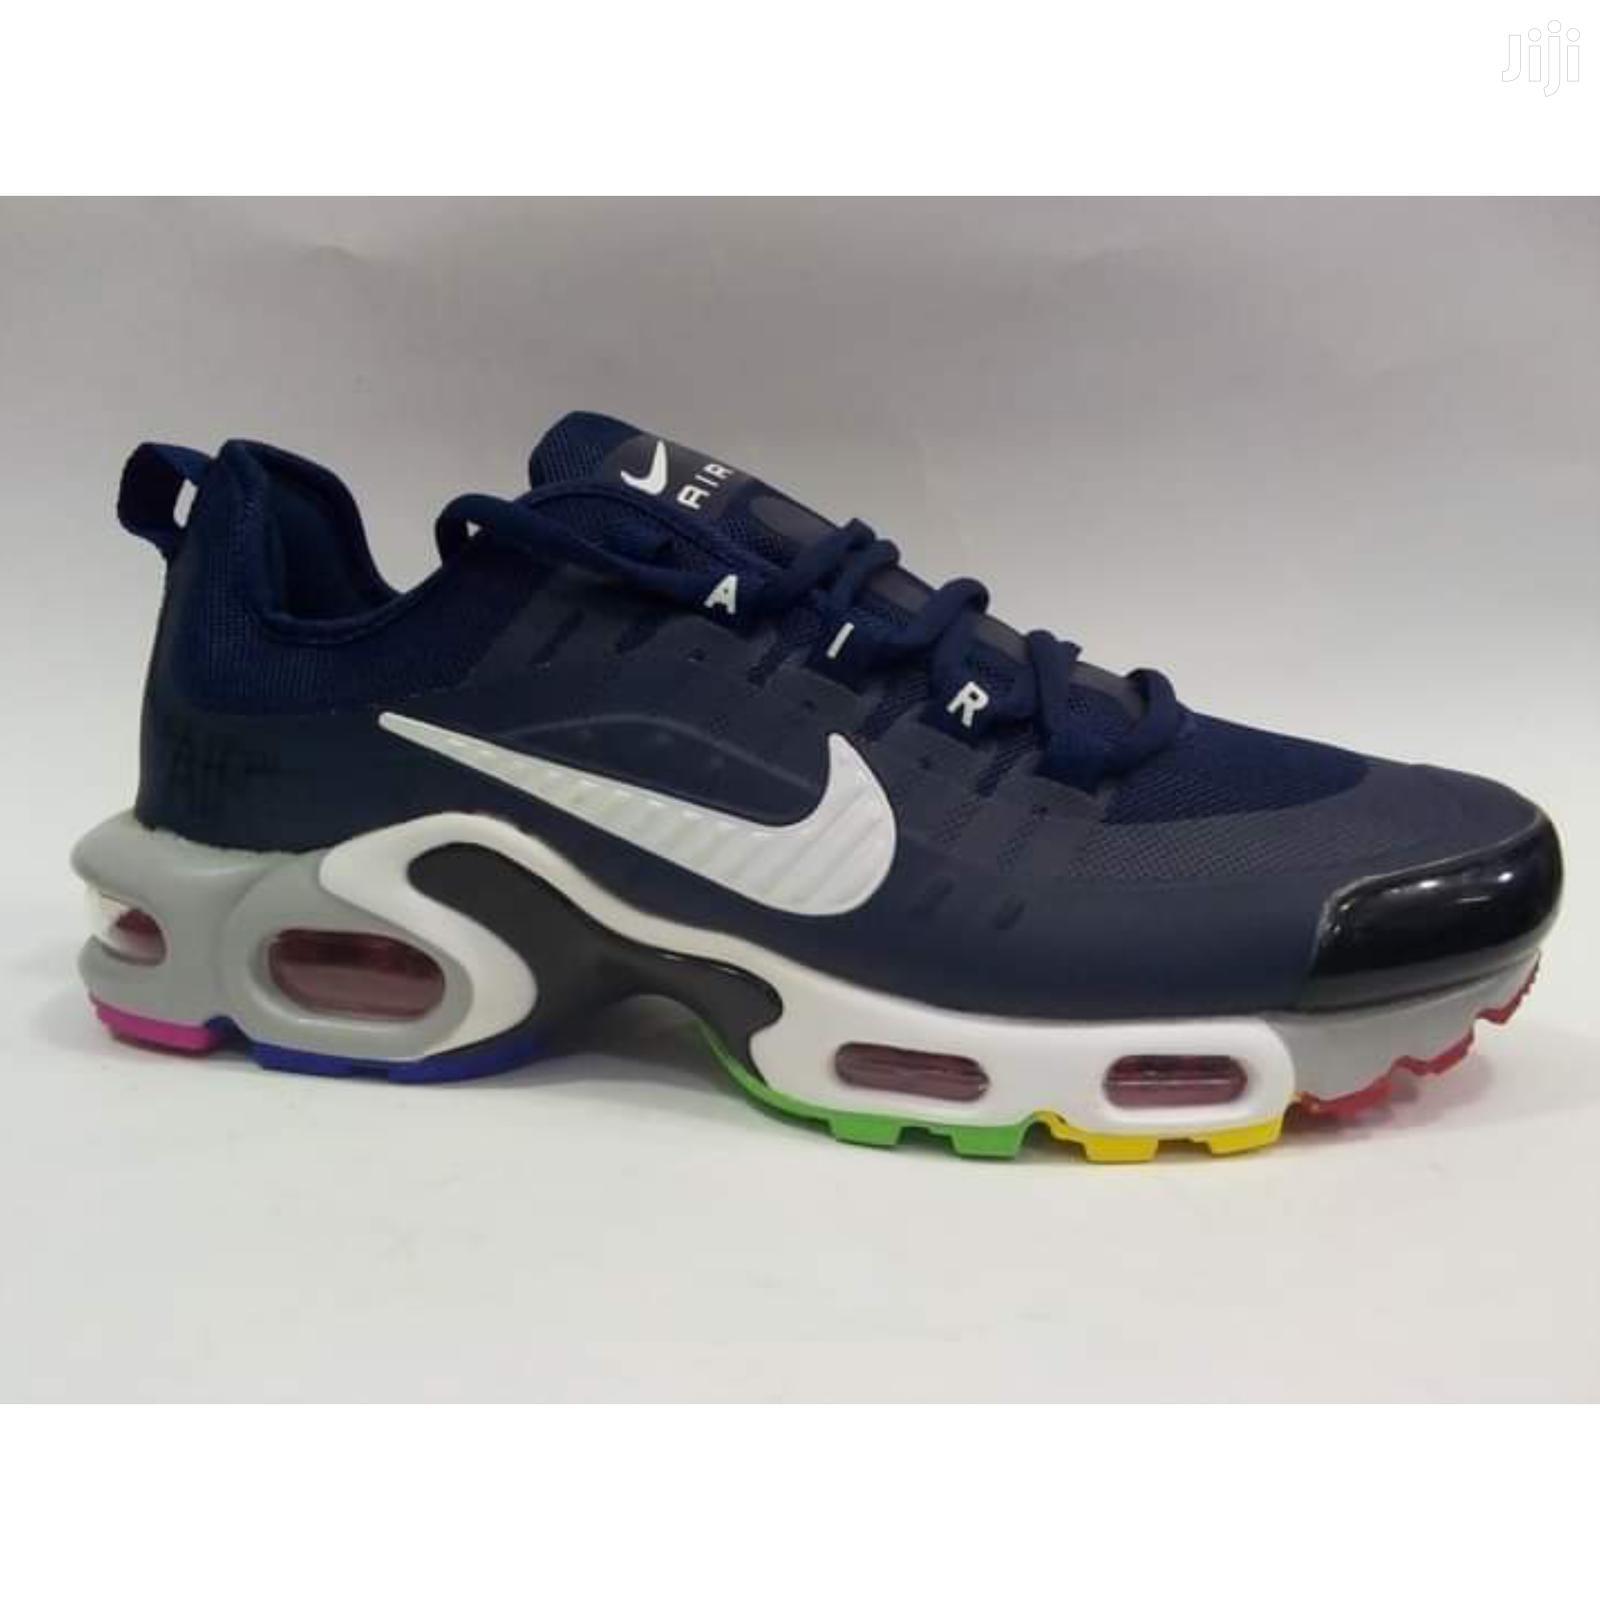 Nike Air Sneakers 7